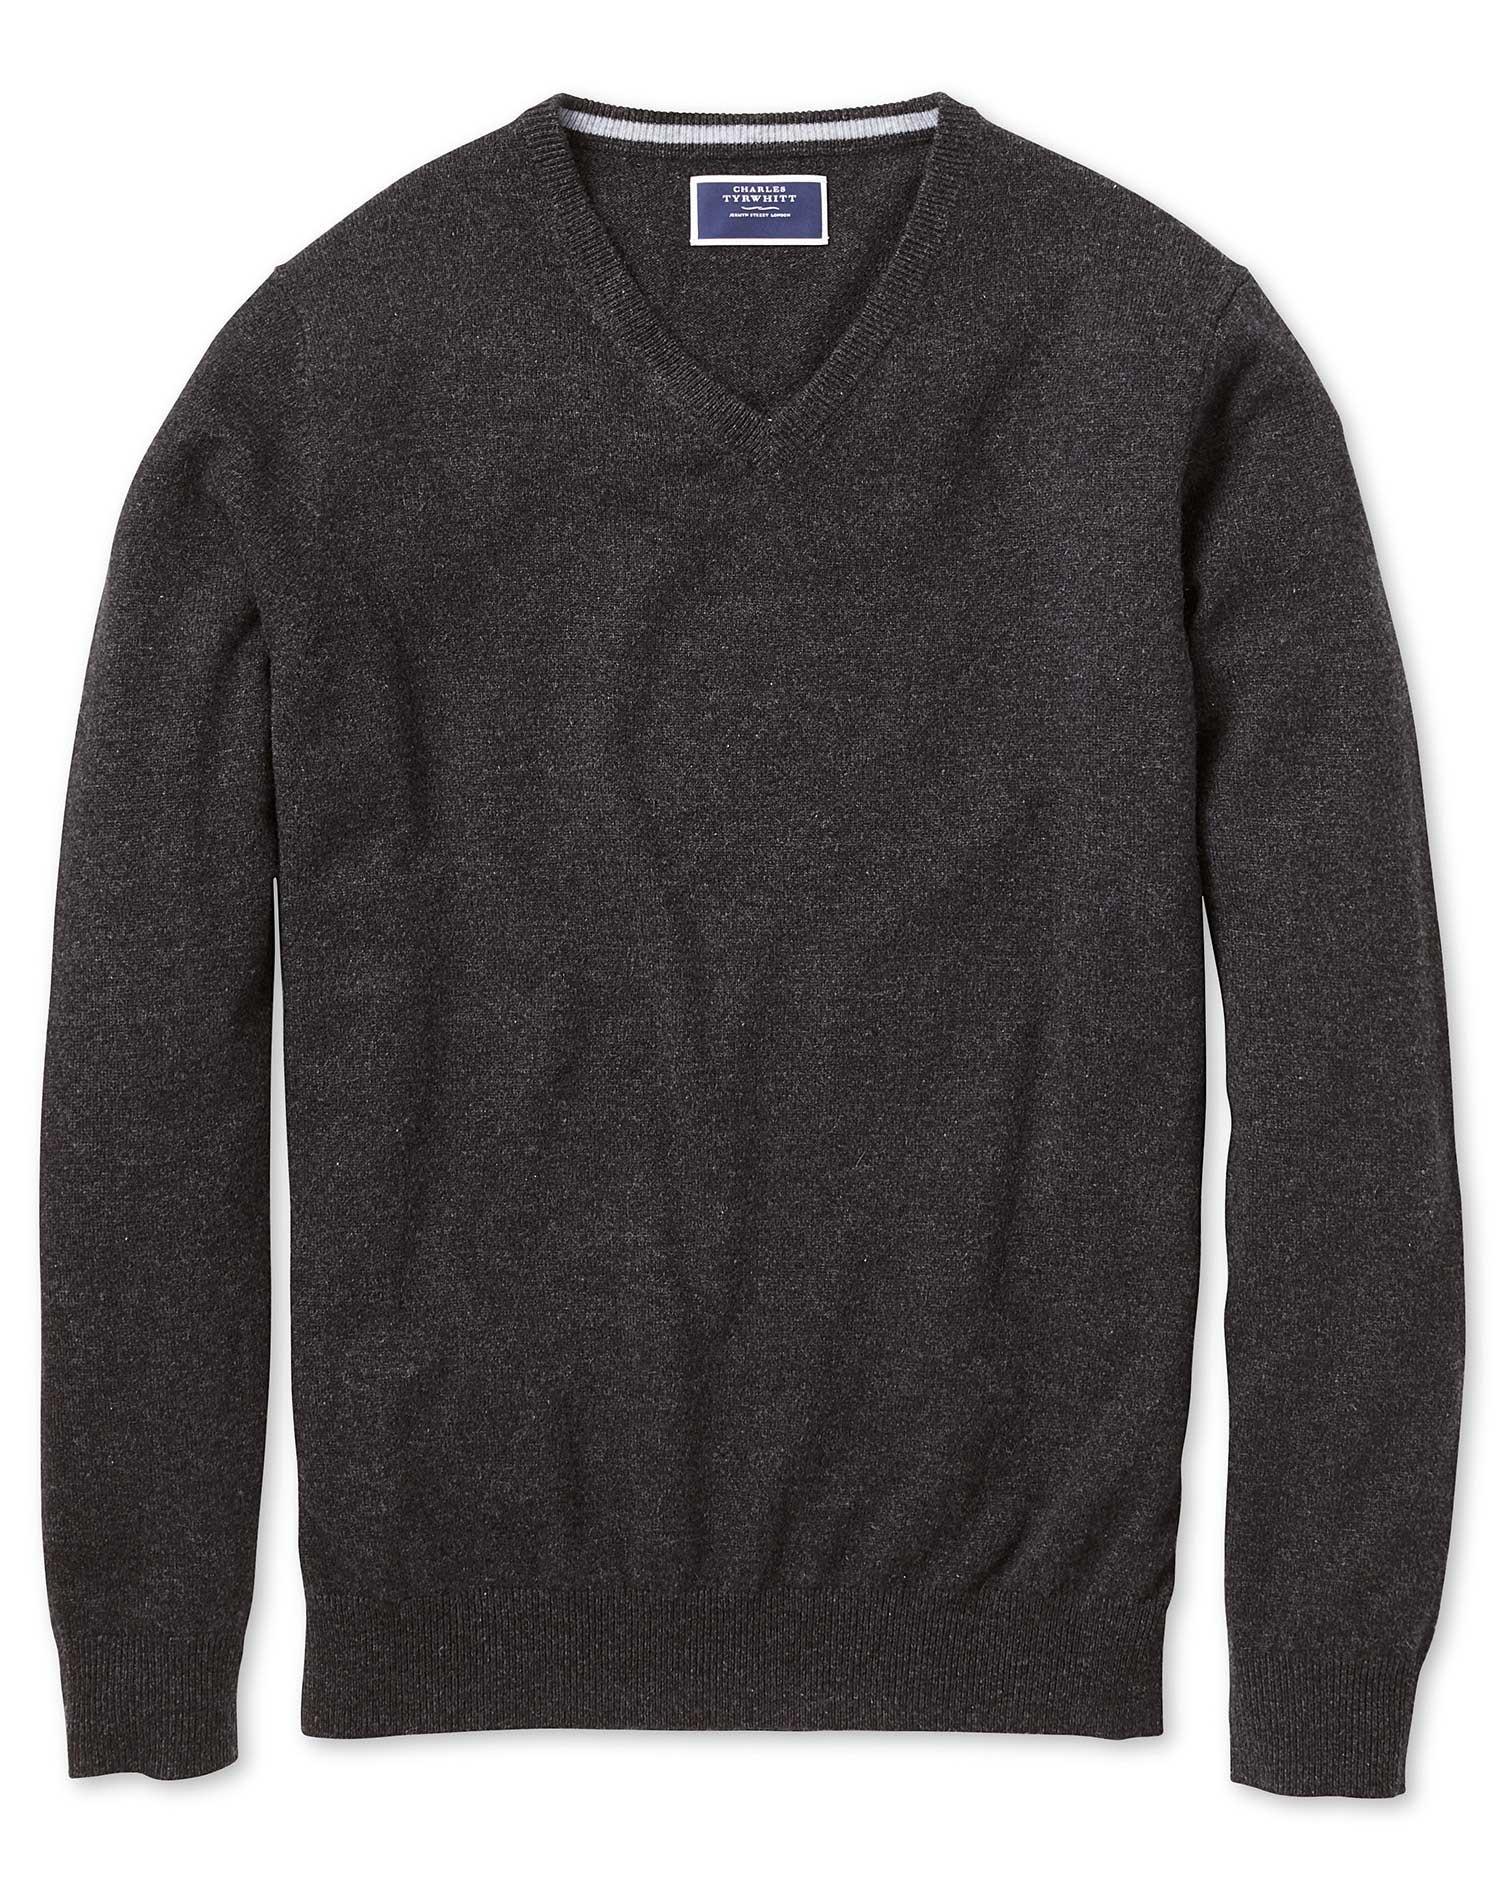 Charcoal V-Neck Cashmere Jumper Size XXL by Charles Tyrwhitt